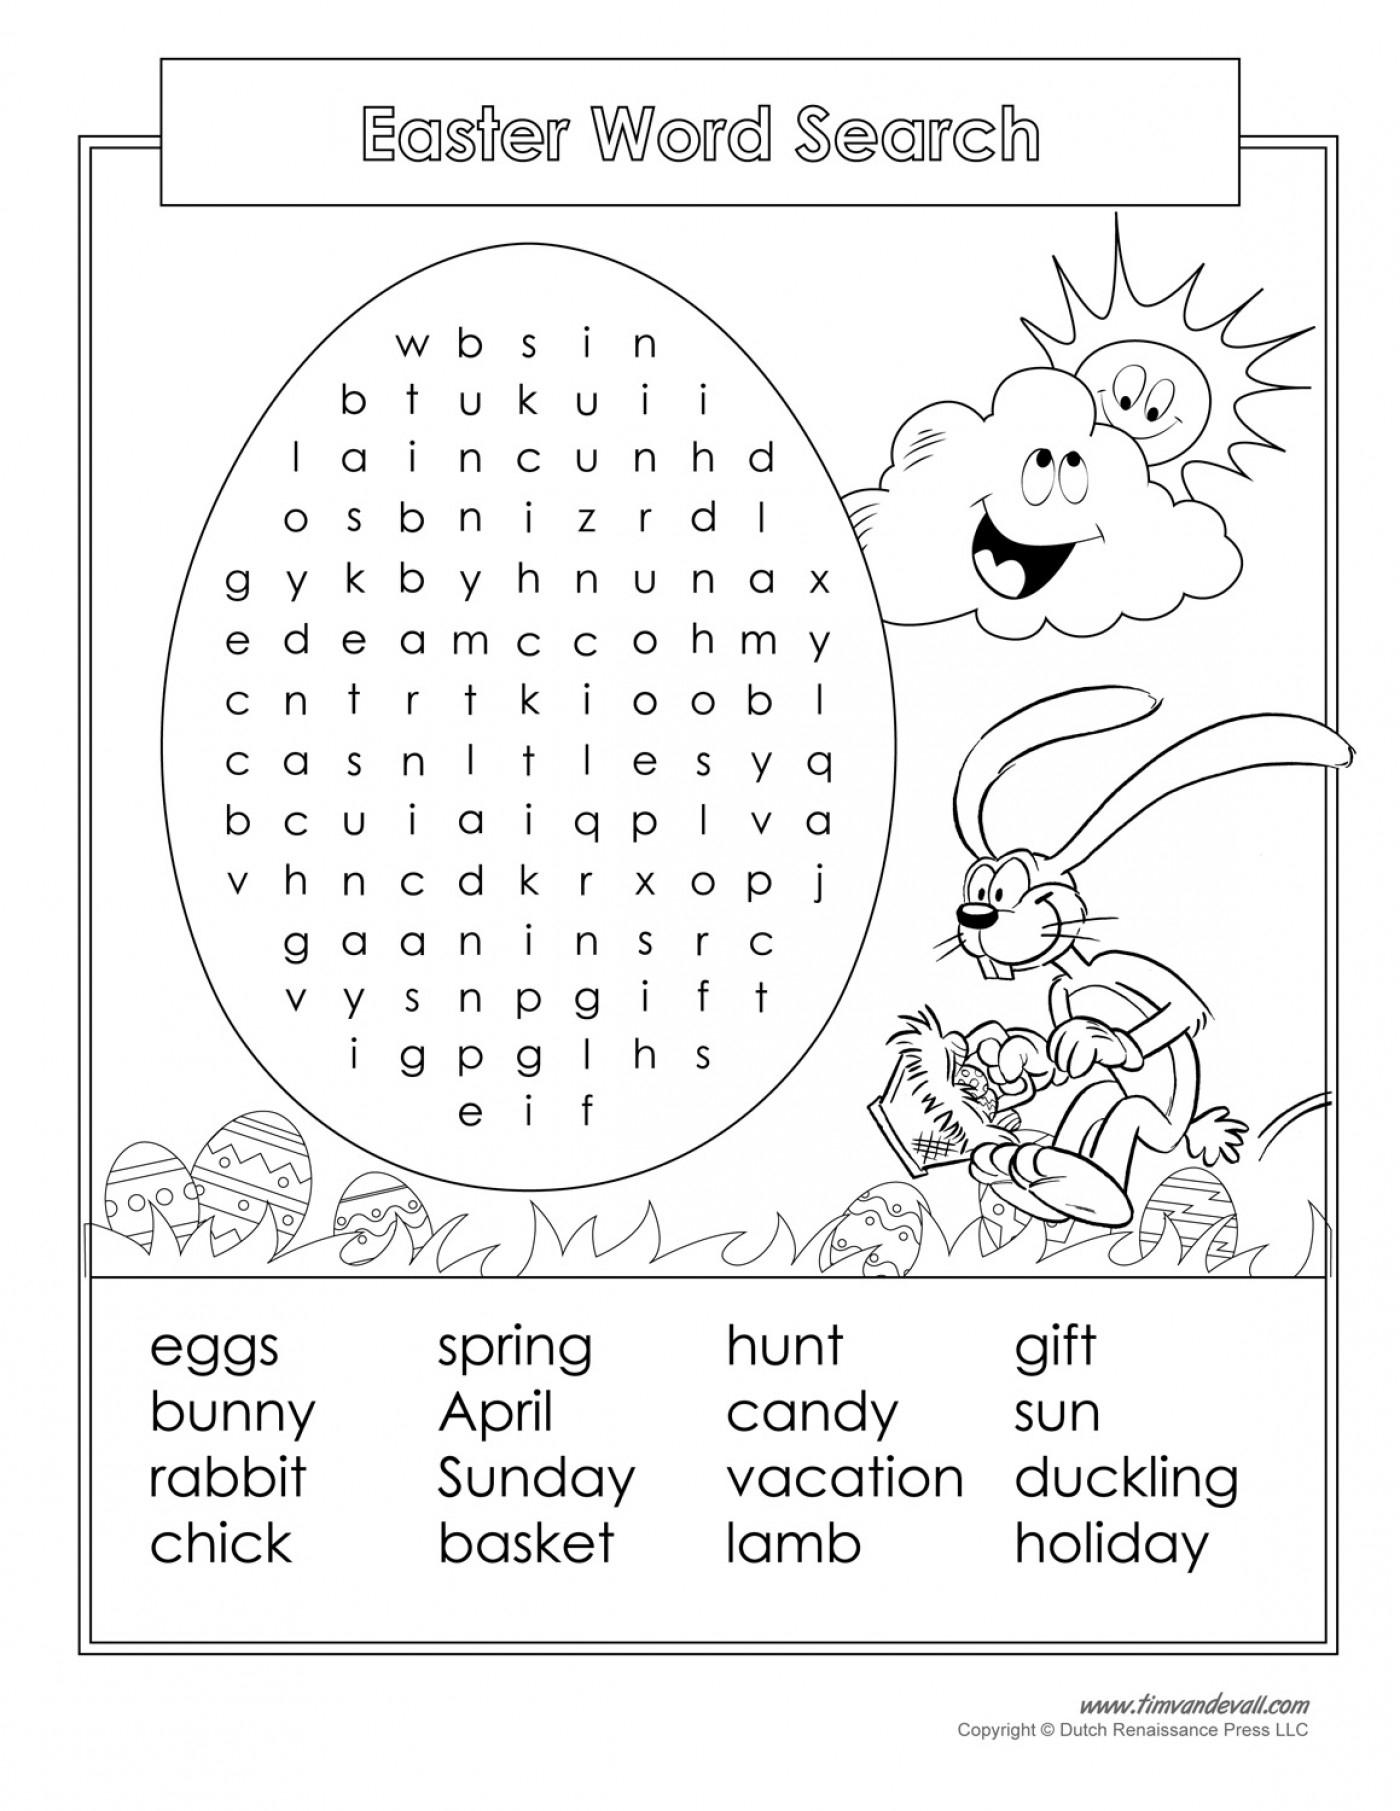 Easter Crossword Puzzle Printable Crosswords Free Word - Free - Printable Crossword Puzzles Easter